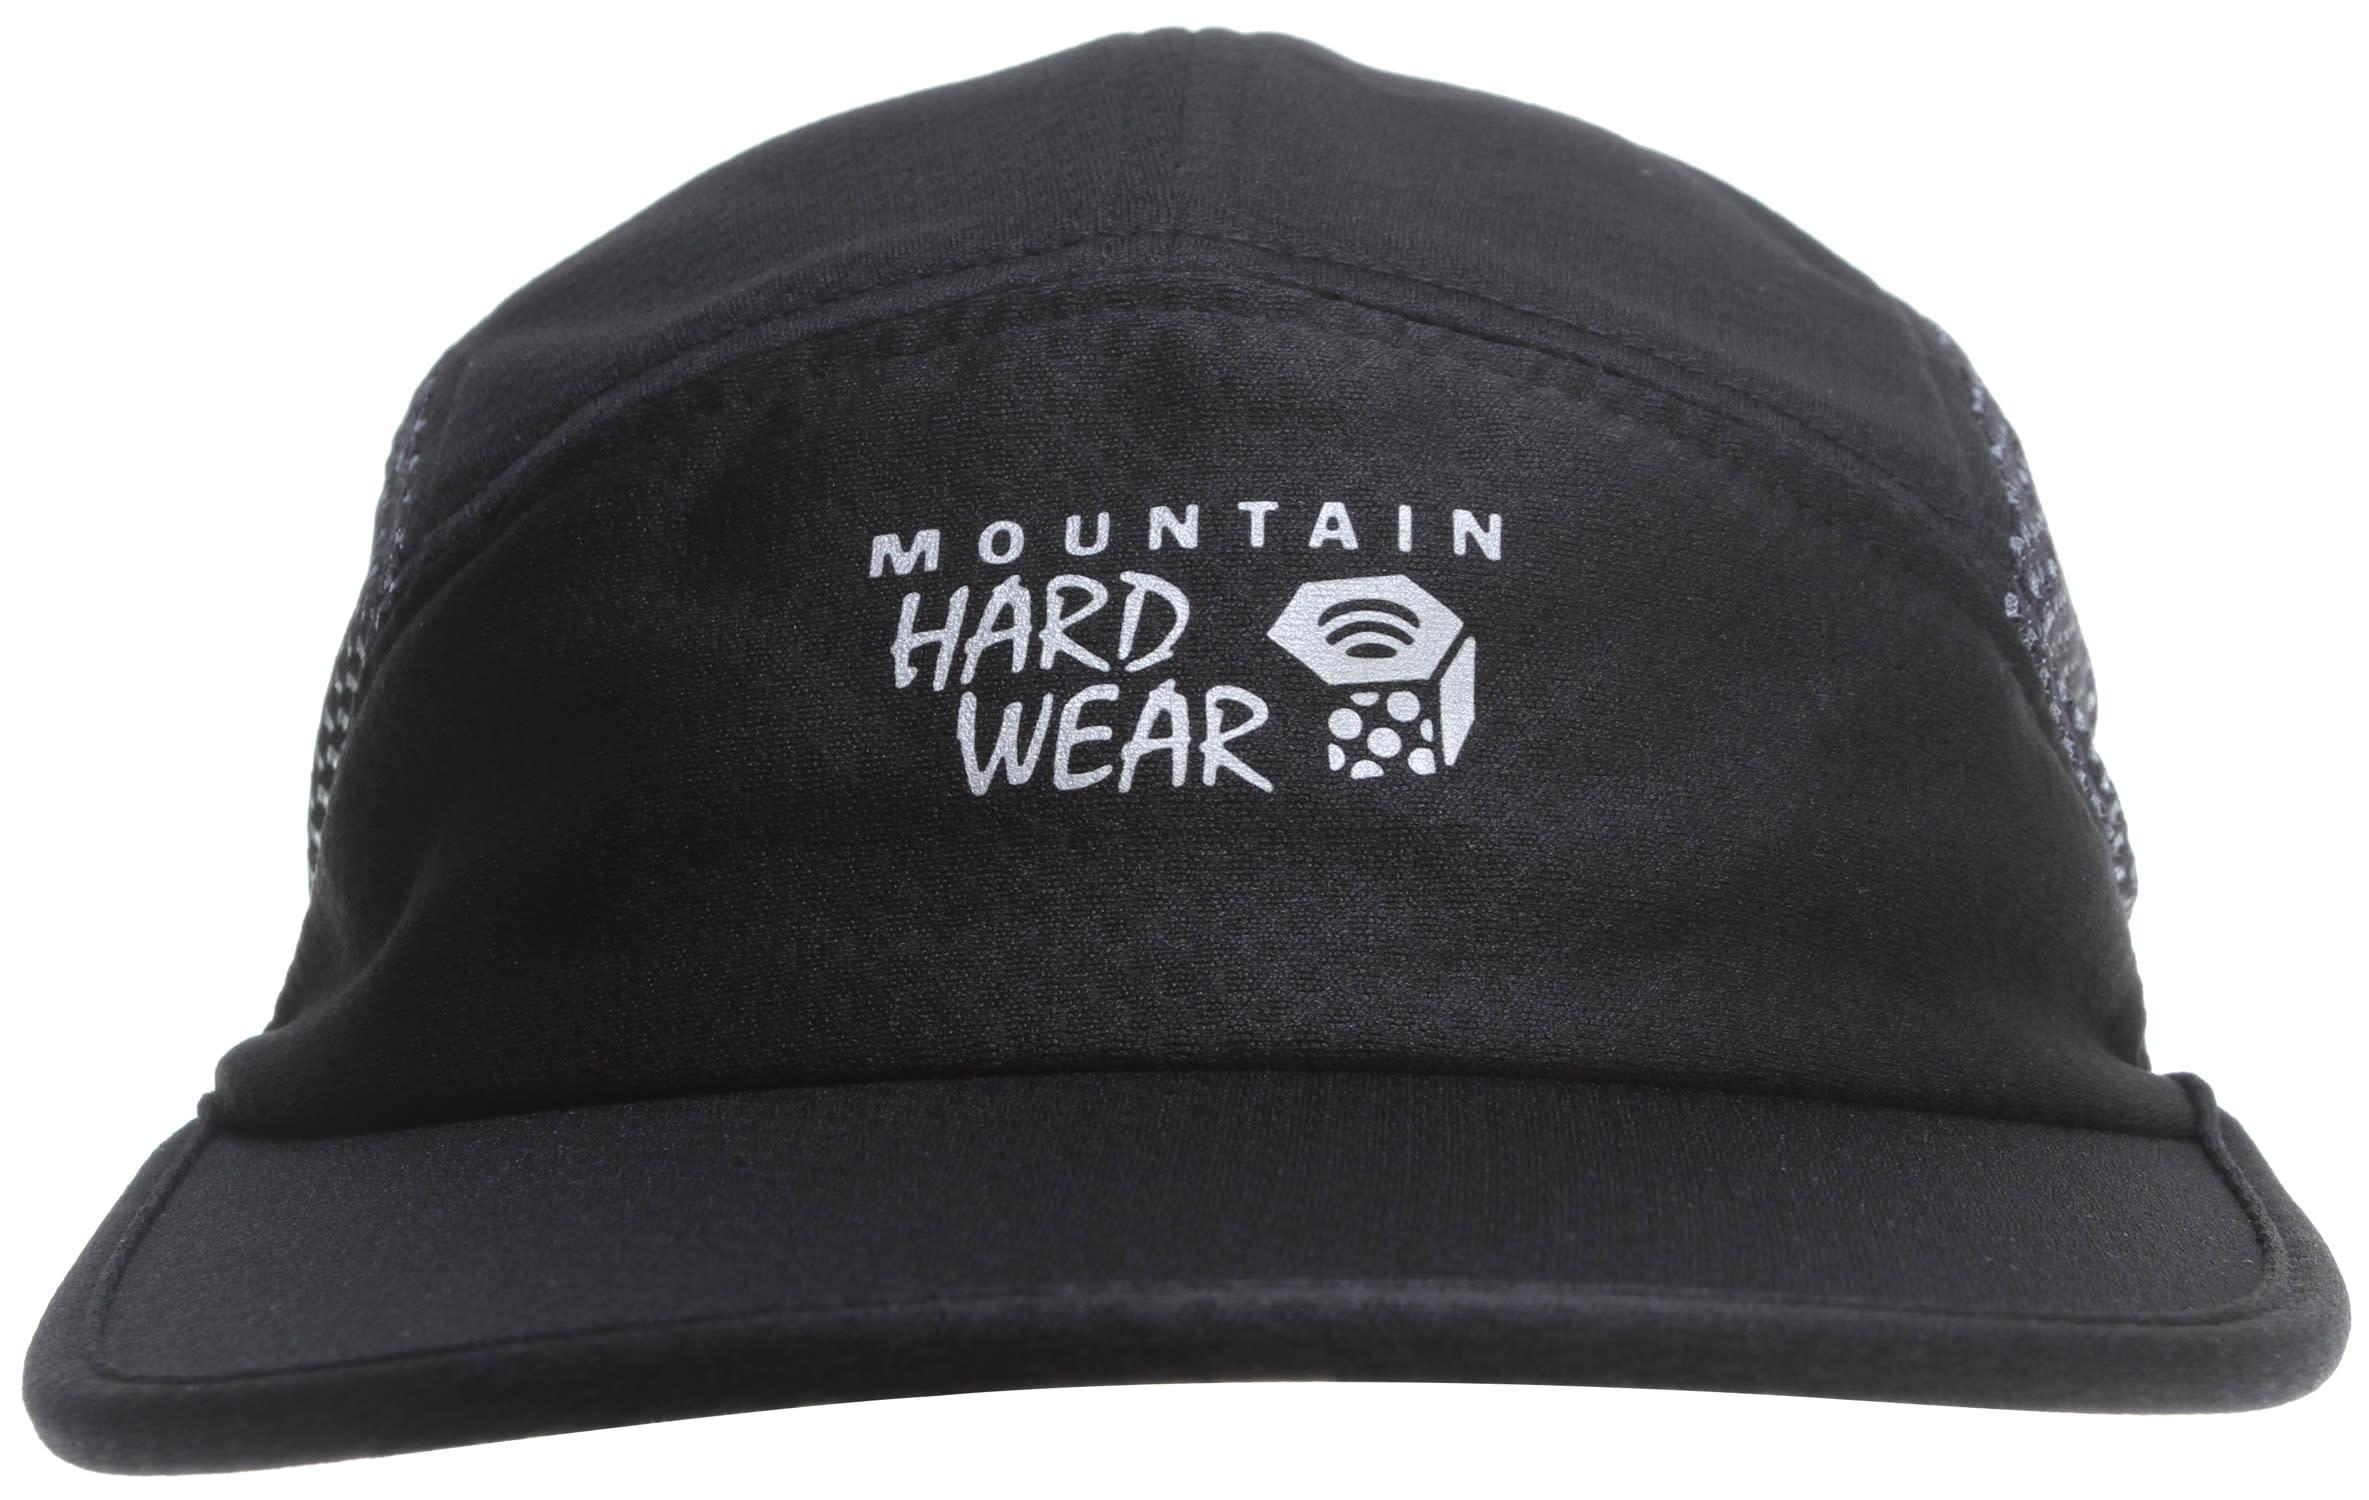 Mountain Hardwear Quasar Running Cap - thumbnail 1 52aafcebc41